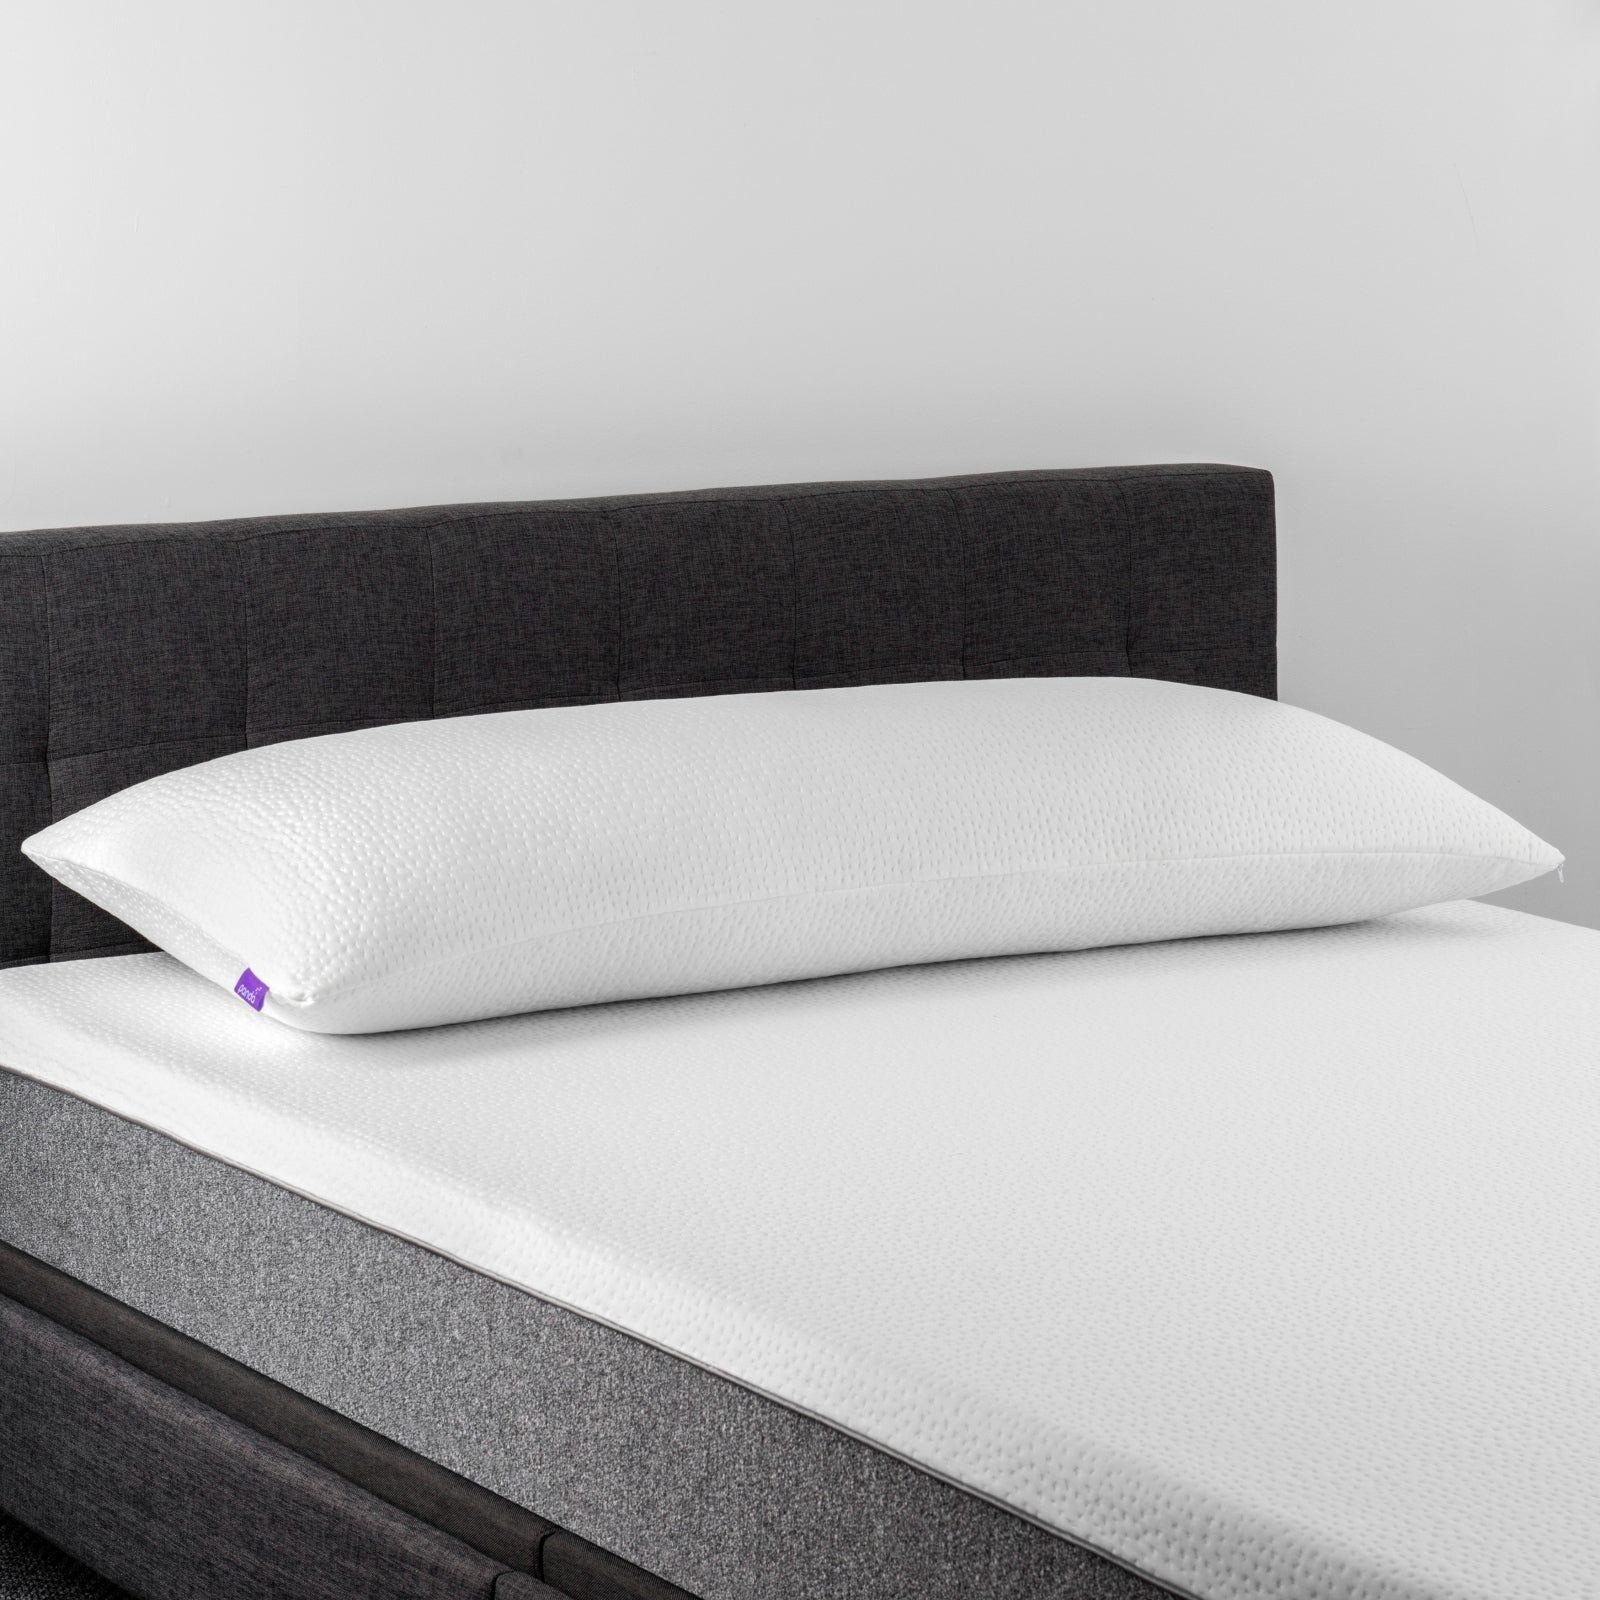 Solace Sleep Panda Oversized Memory Foam Body Pillow Medium Firm